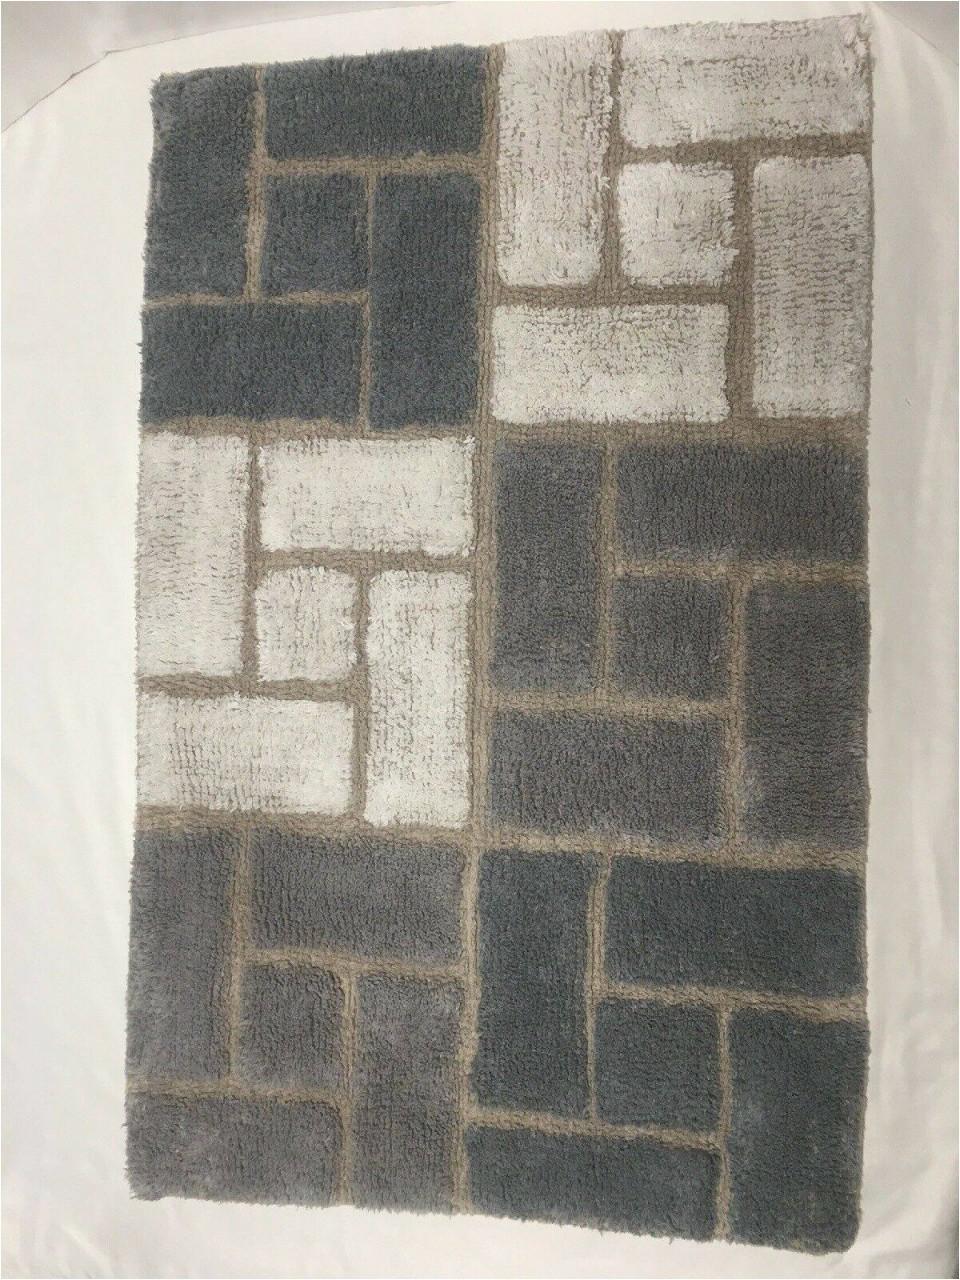 Charcoal Grey Bath Rugs Dark Grey Bathroom Rug Set Image Of Bathroom and Closet